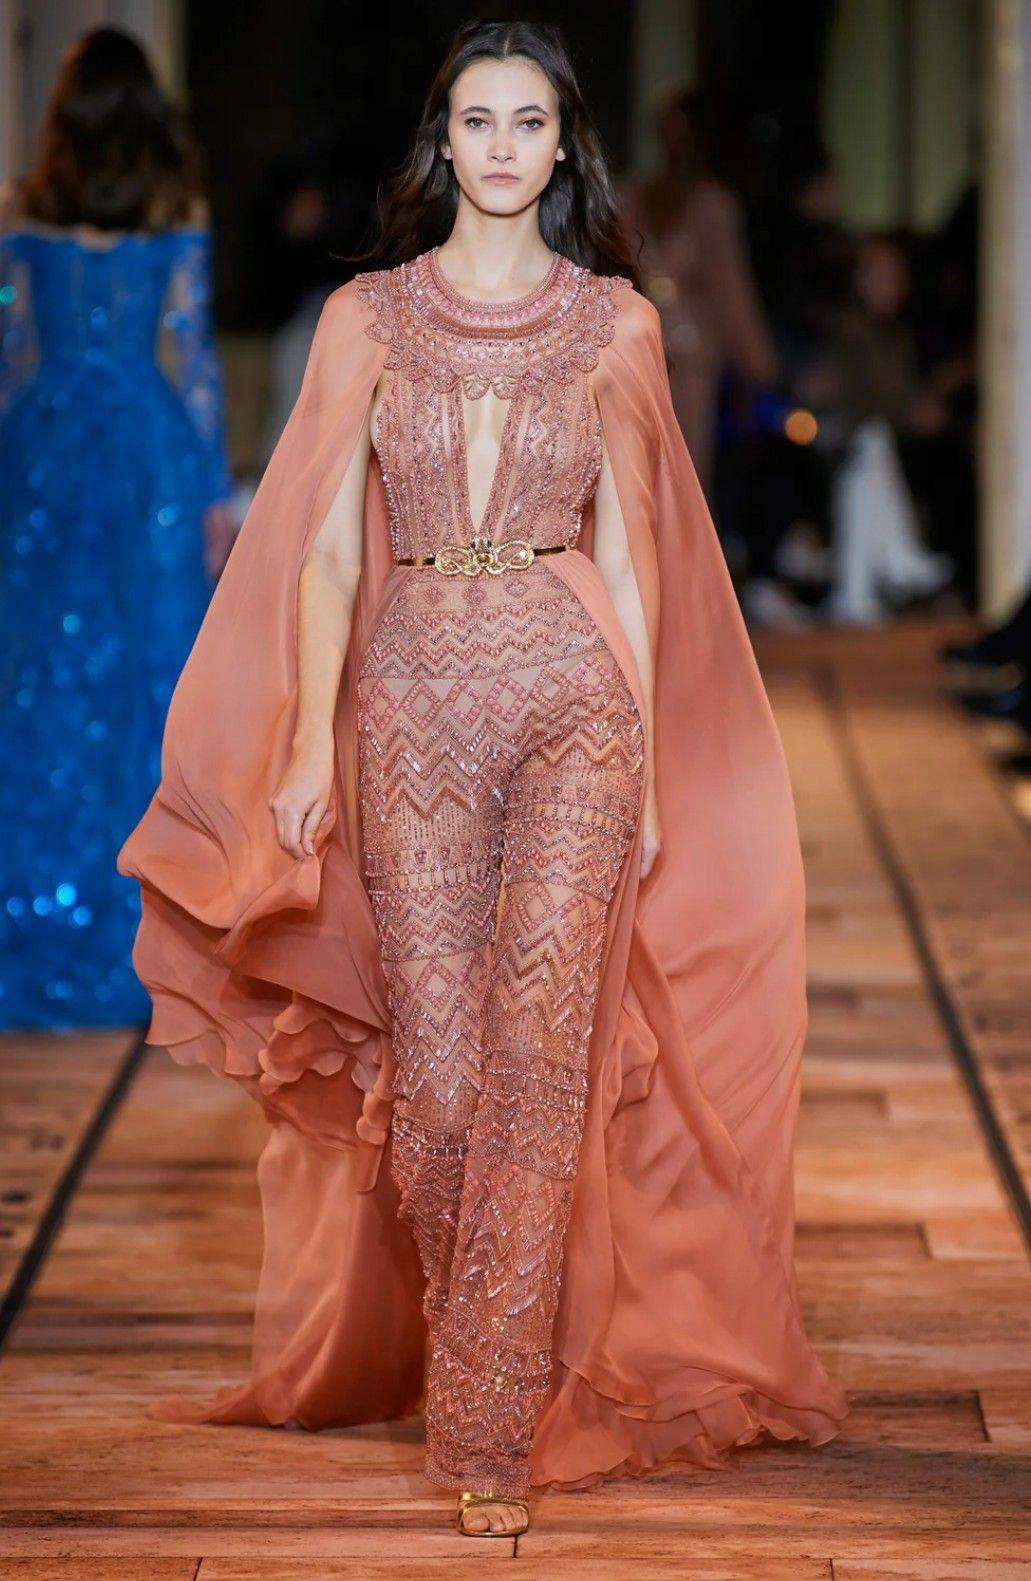 Pin by Vanda Desiree on ♡Zuhair Murad | Egyptian fashion ...